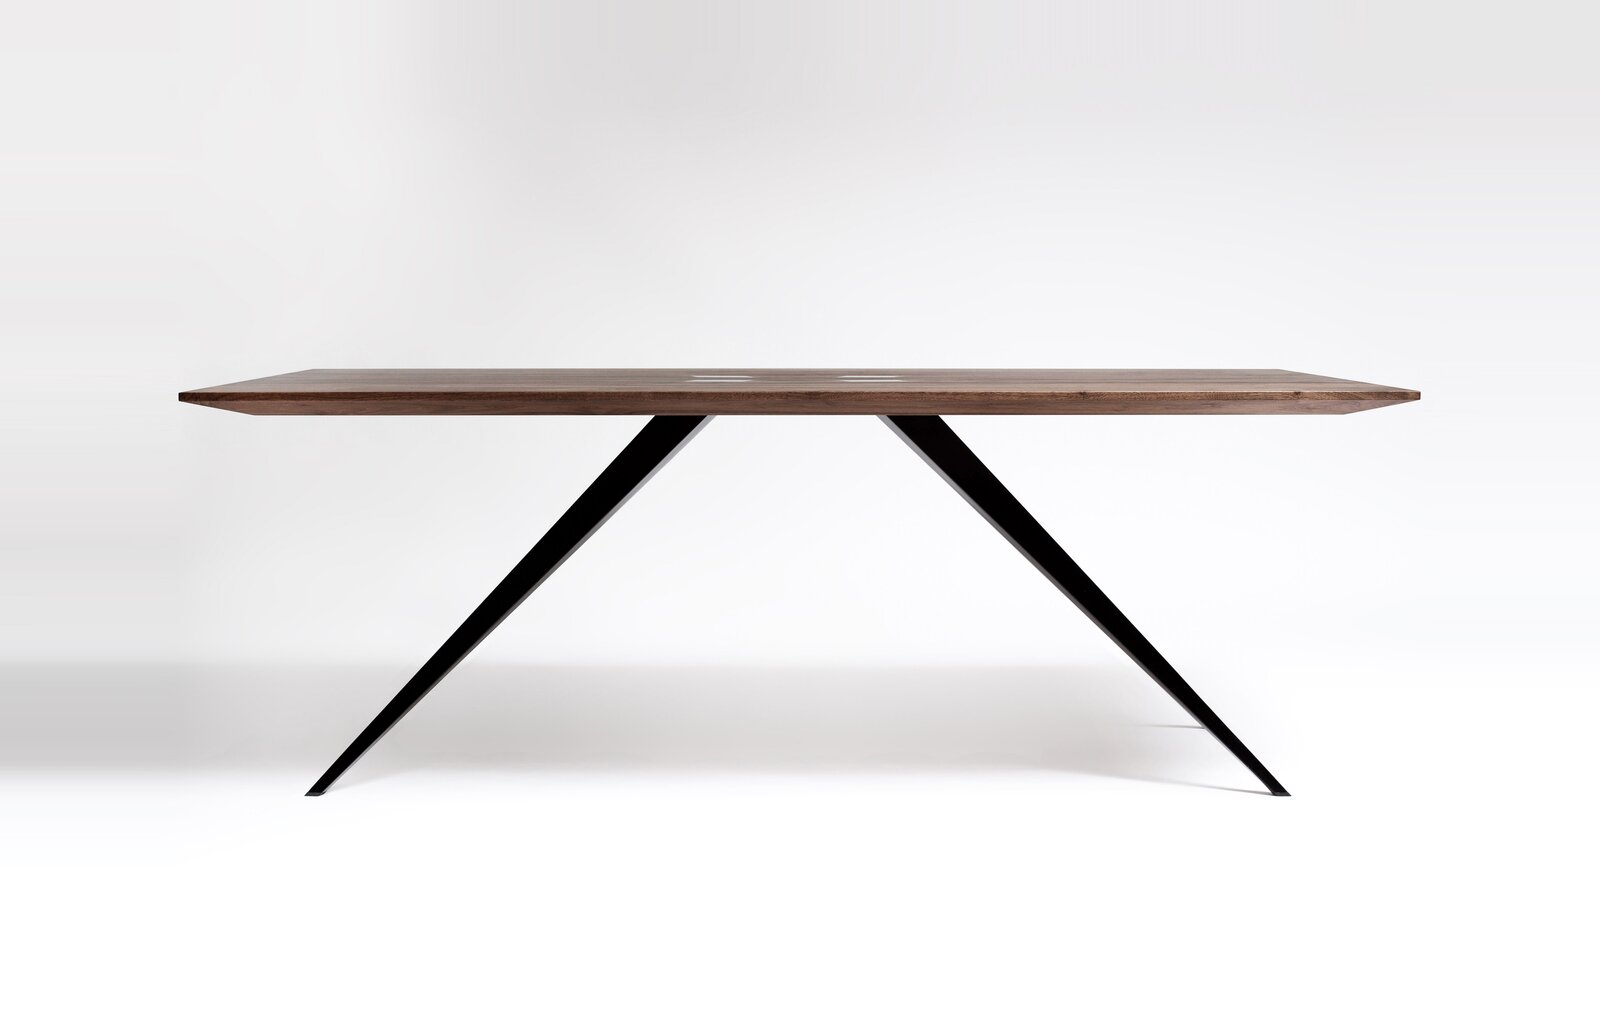 Photo 1 of 7 in Designer to Know: Manjiro Design